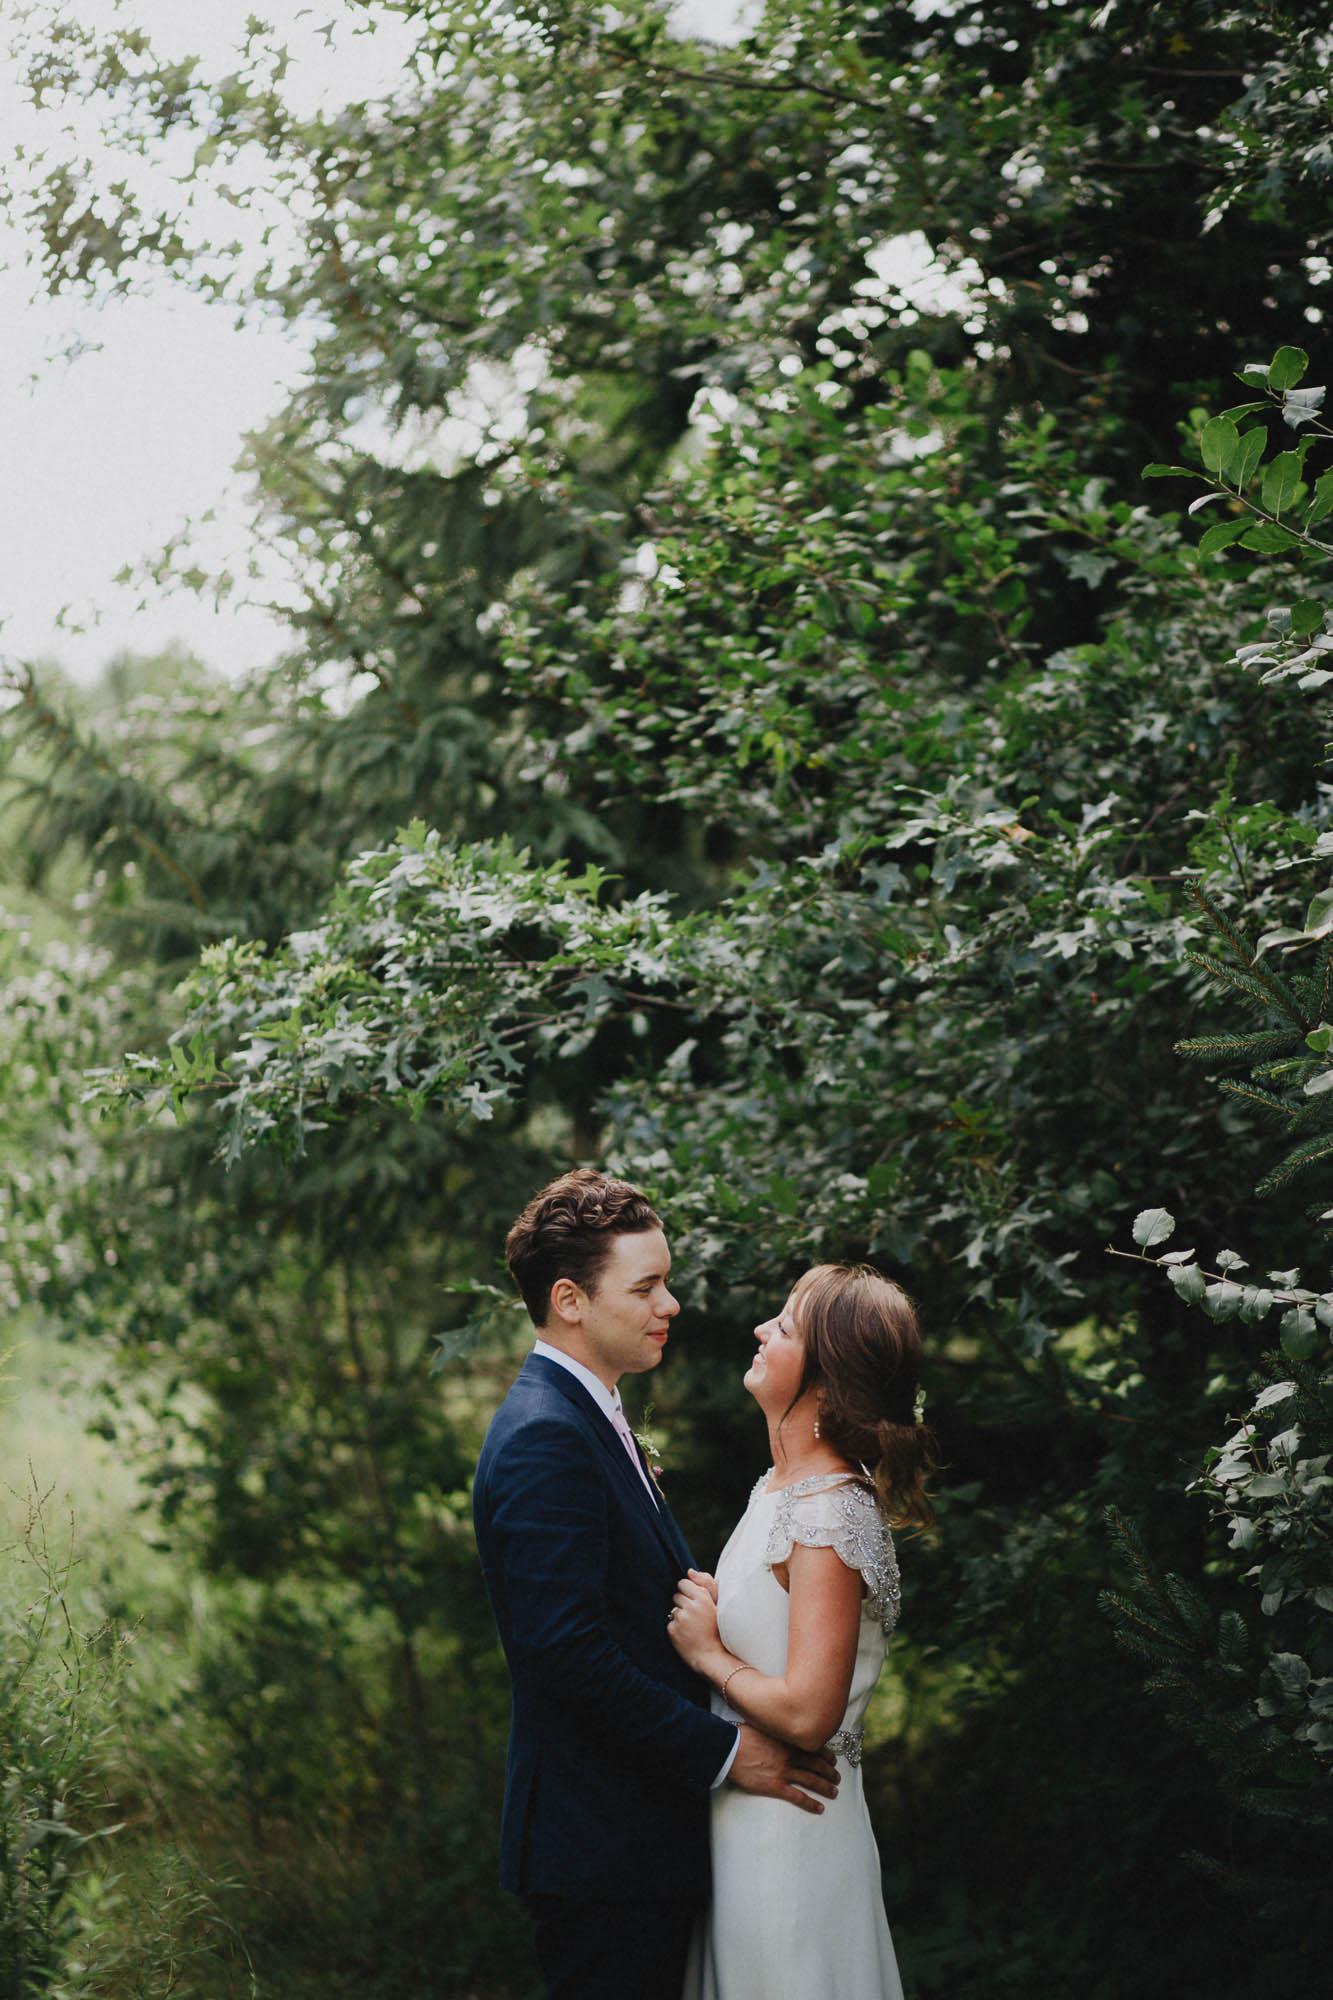 Leah-Graham-Michigan-Outdoor-DIY-Wedding-077@2x.jpg